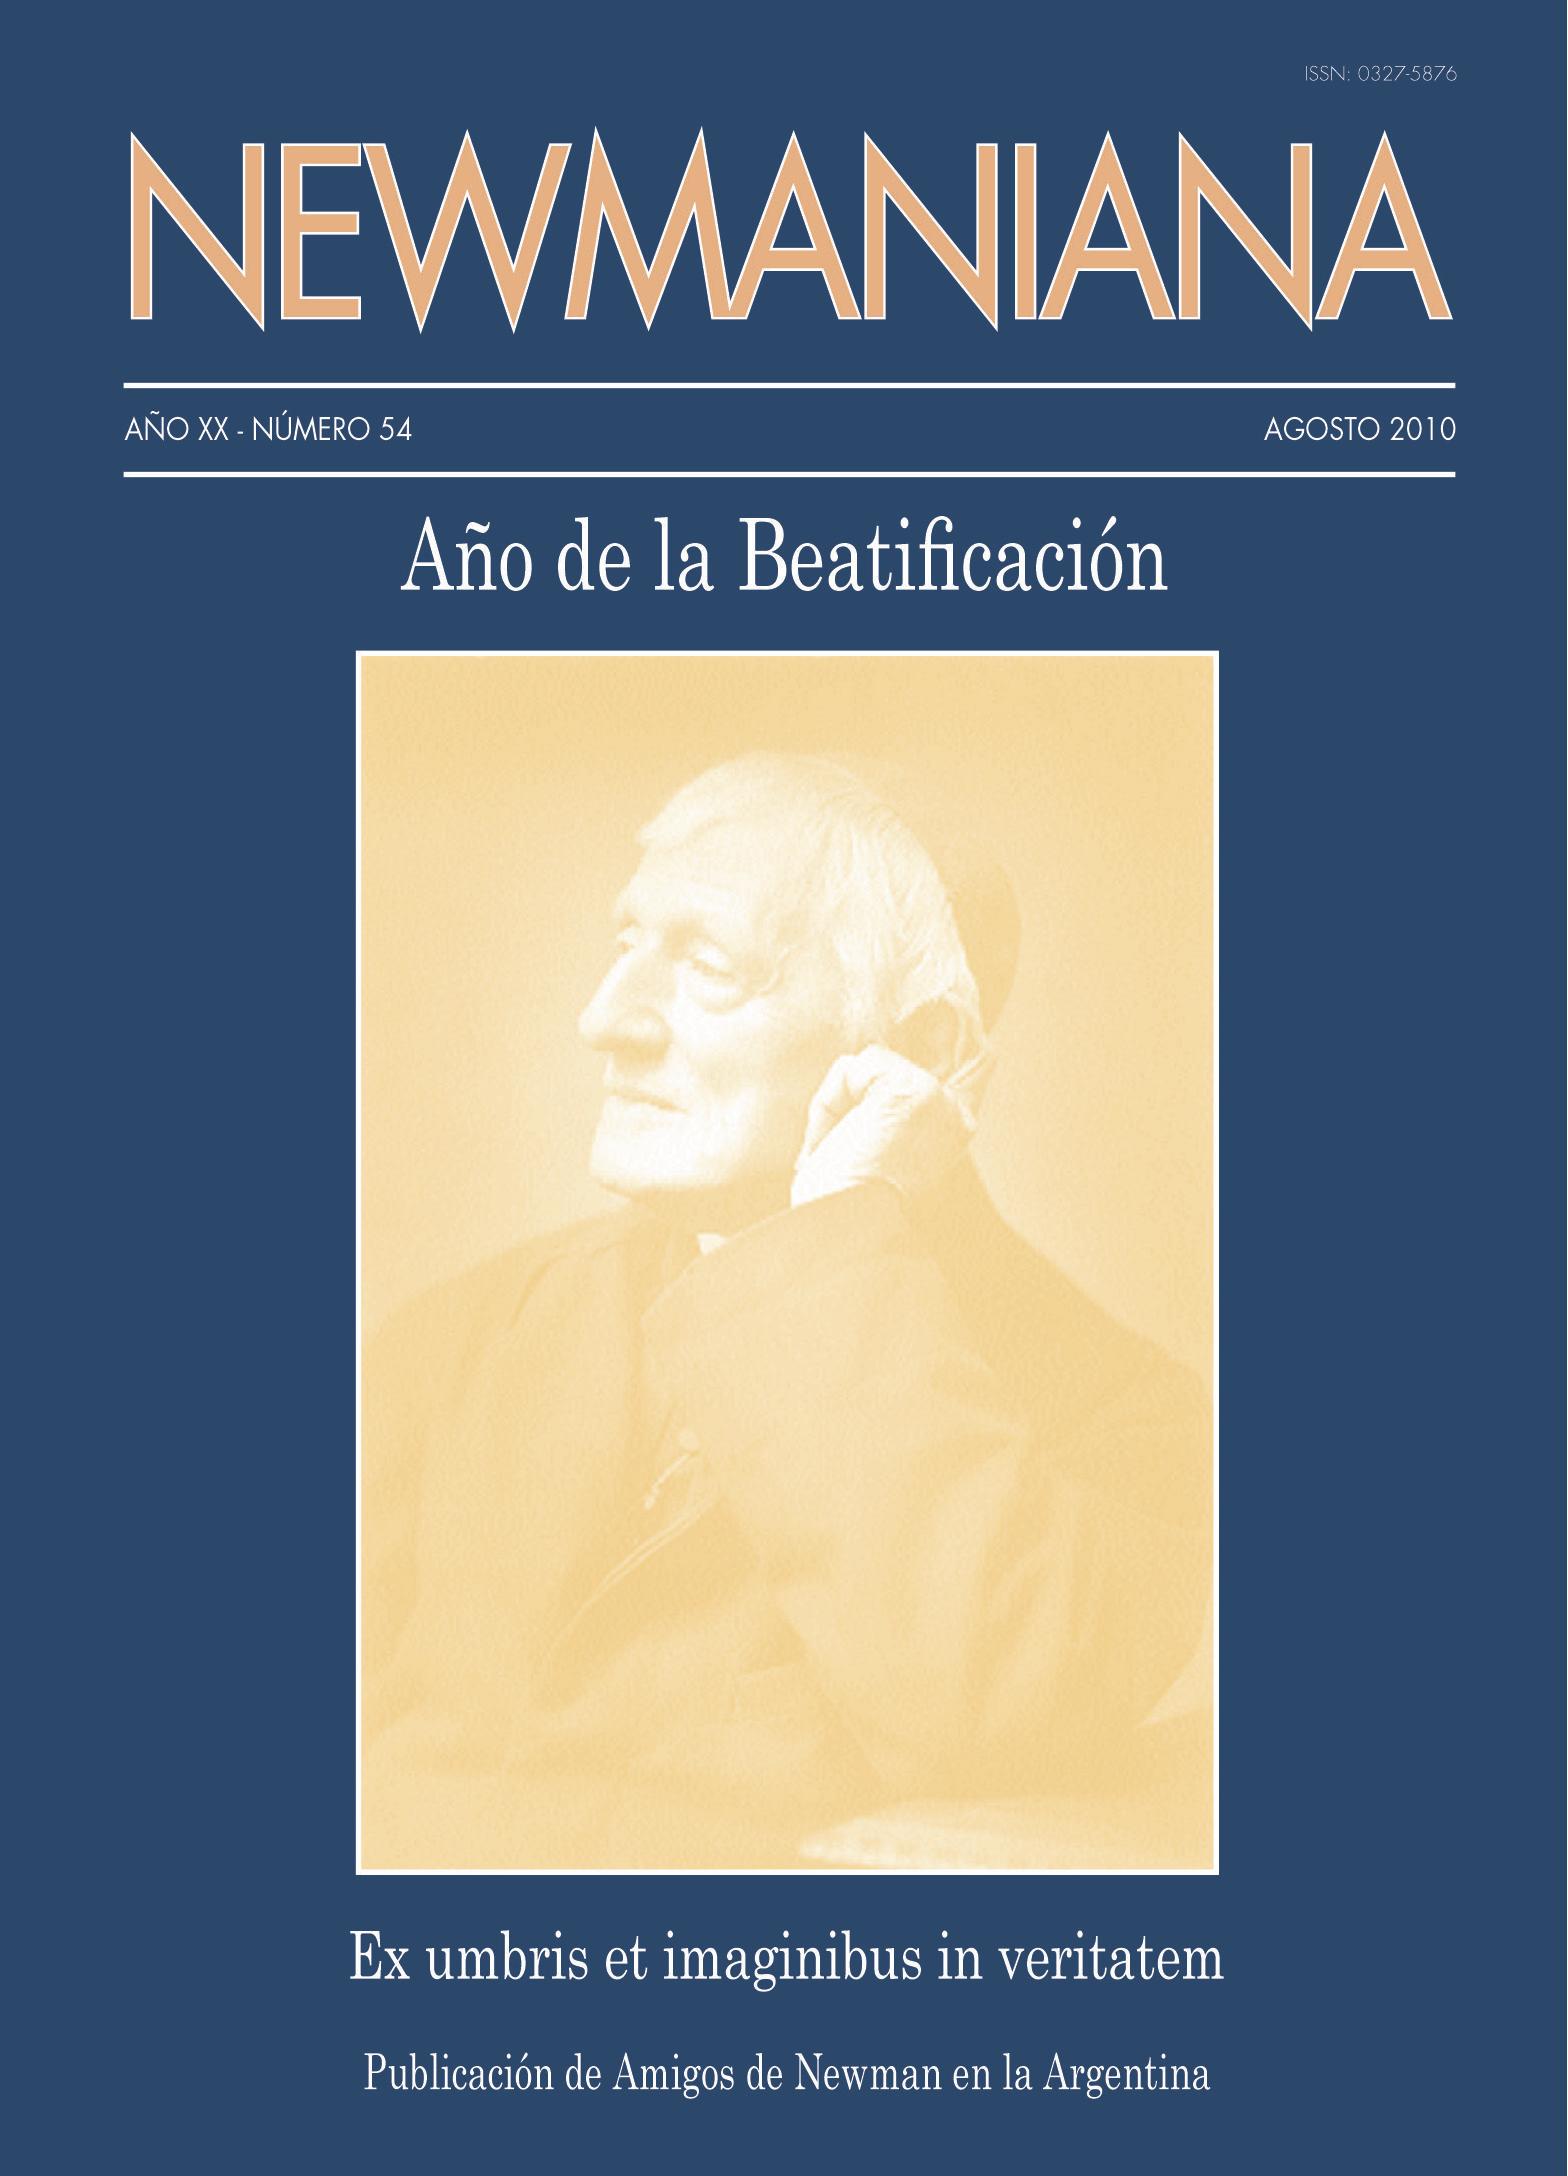 Revista Newmaniana 54 – Agosto 2010